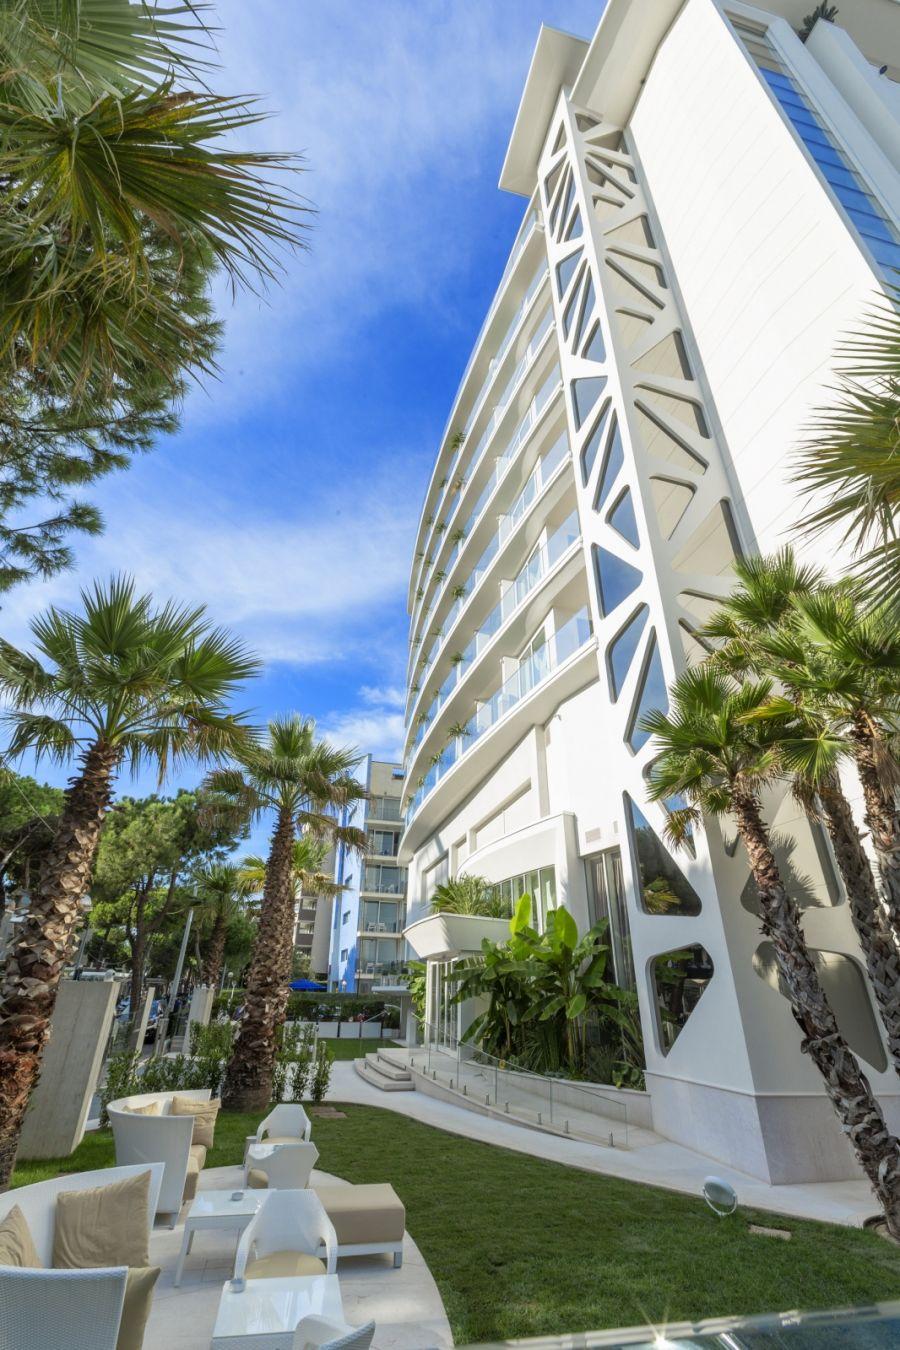 All Inclusive offer 4-star Hotel Rimini on the beach